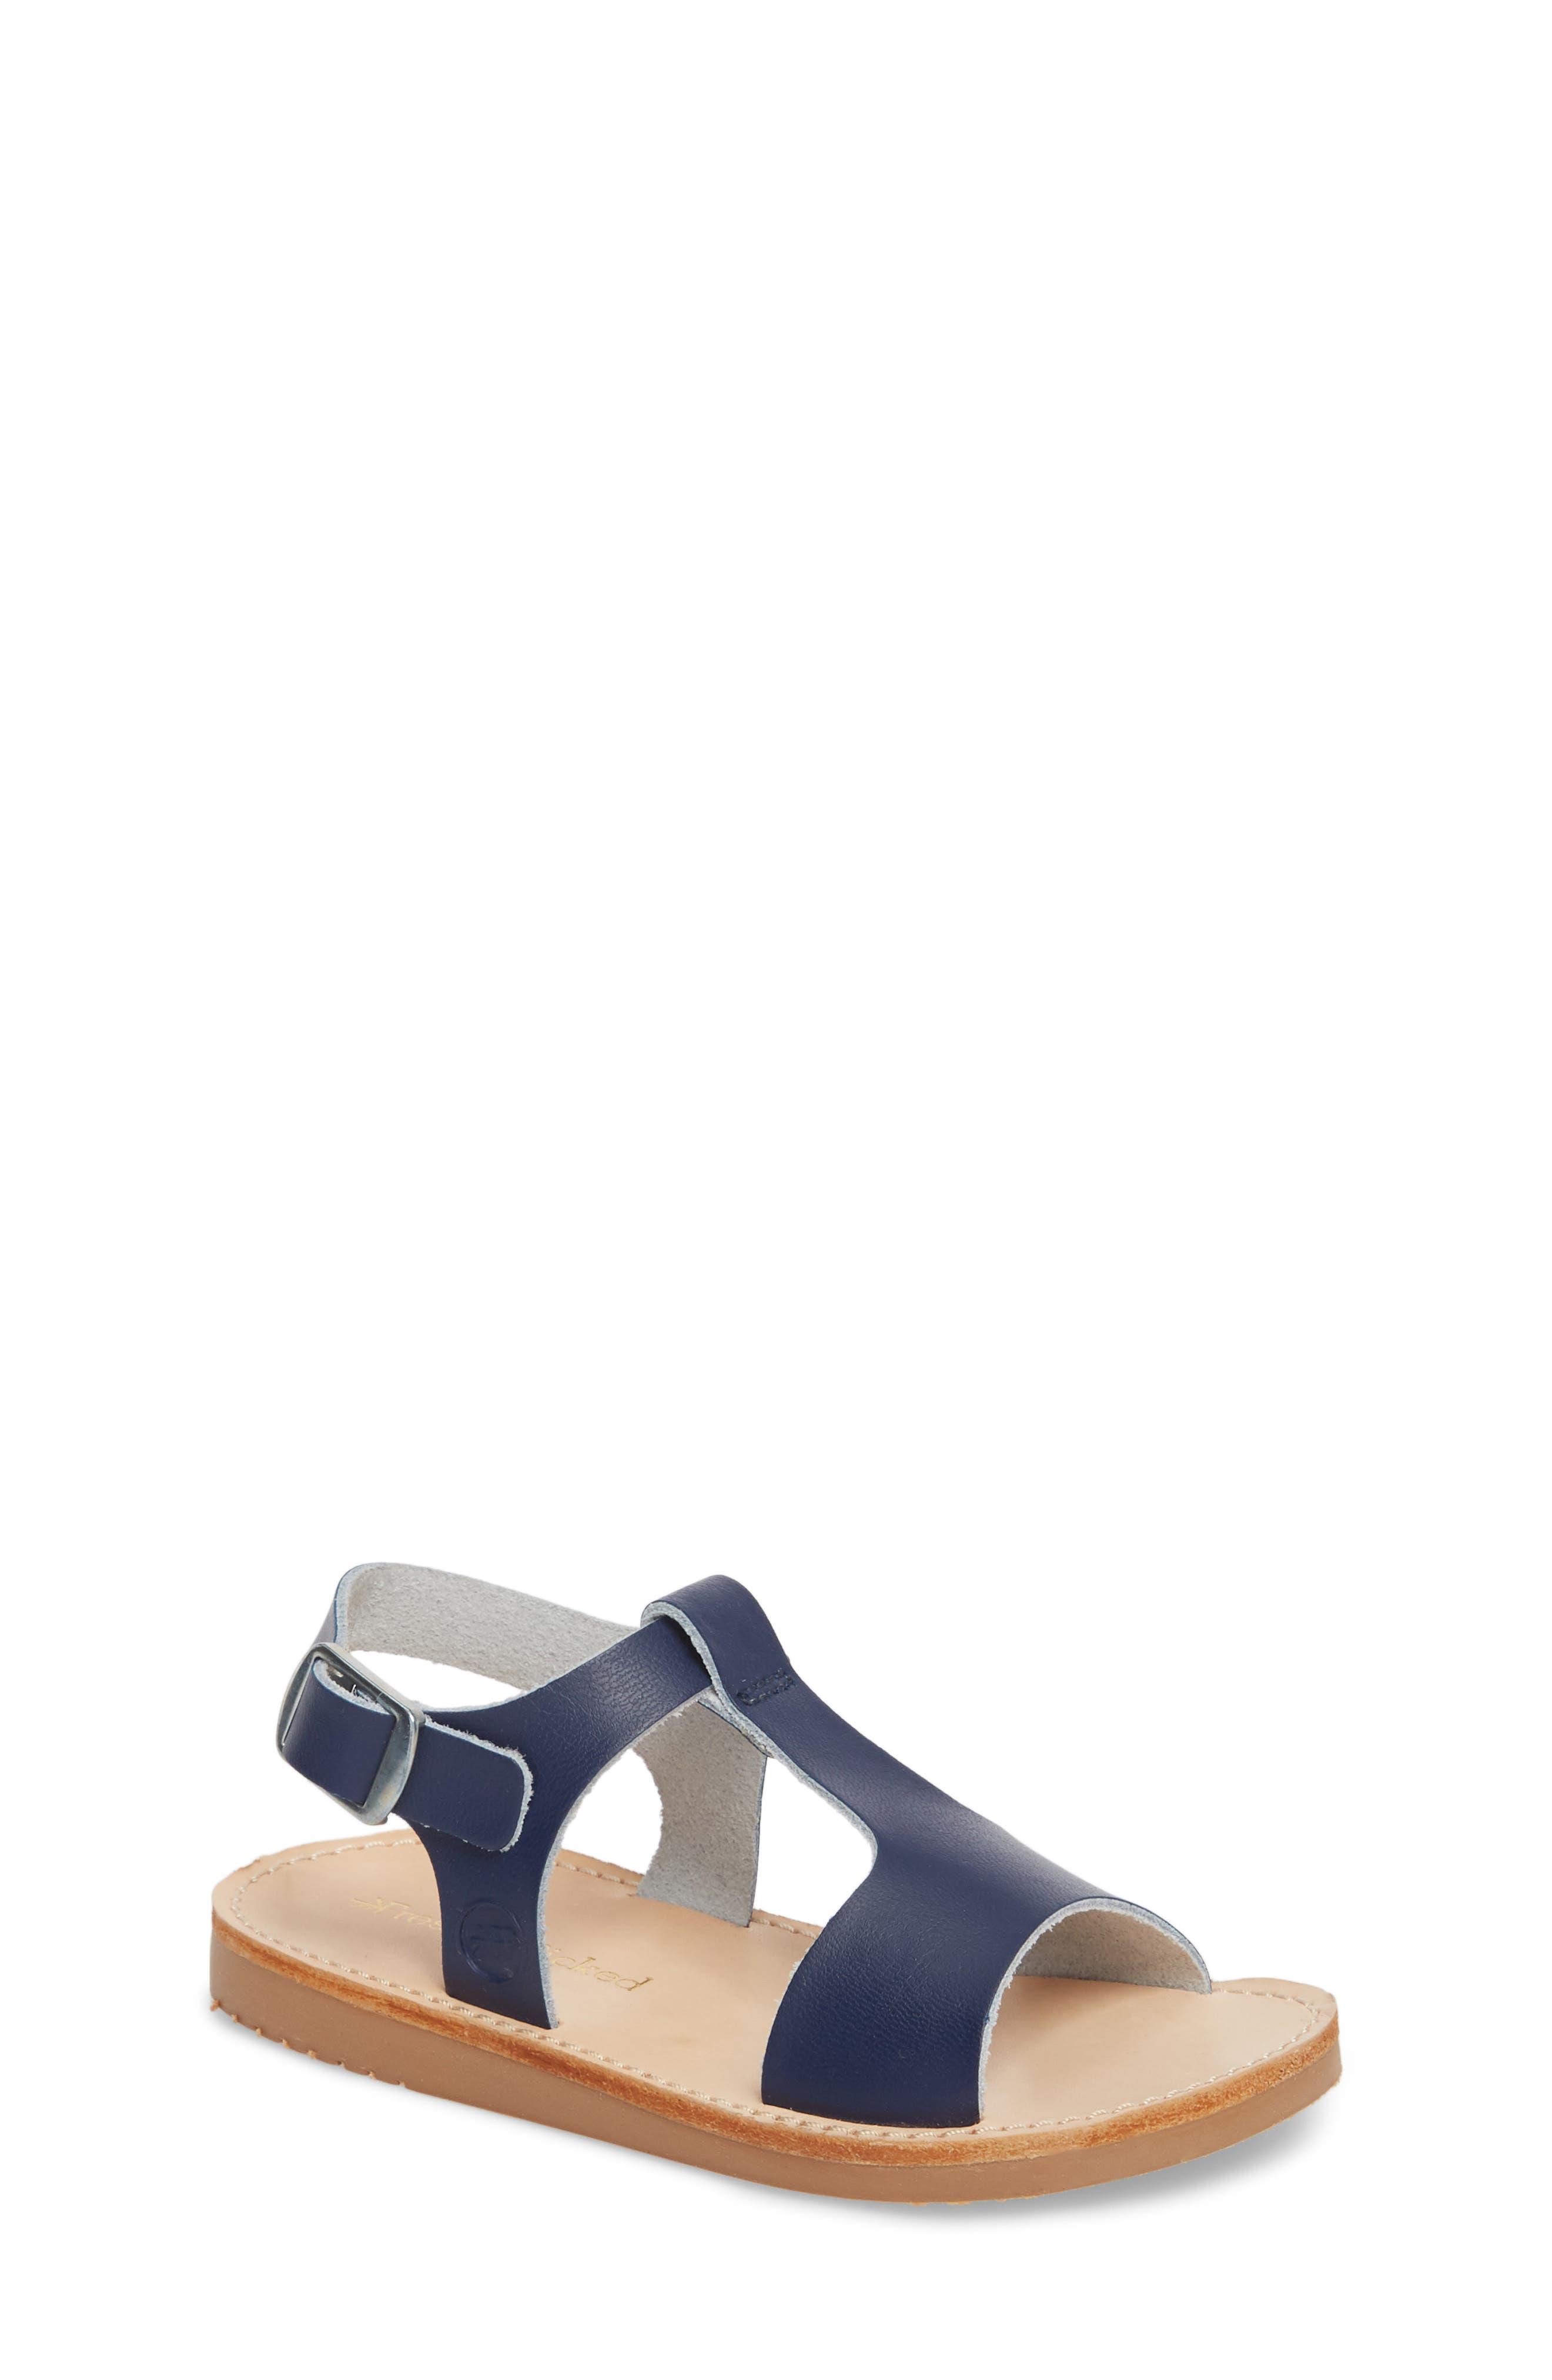 Malibu Water Resistant Sandal,                             Main thumbnail 1, color,                             Navy